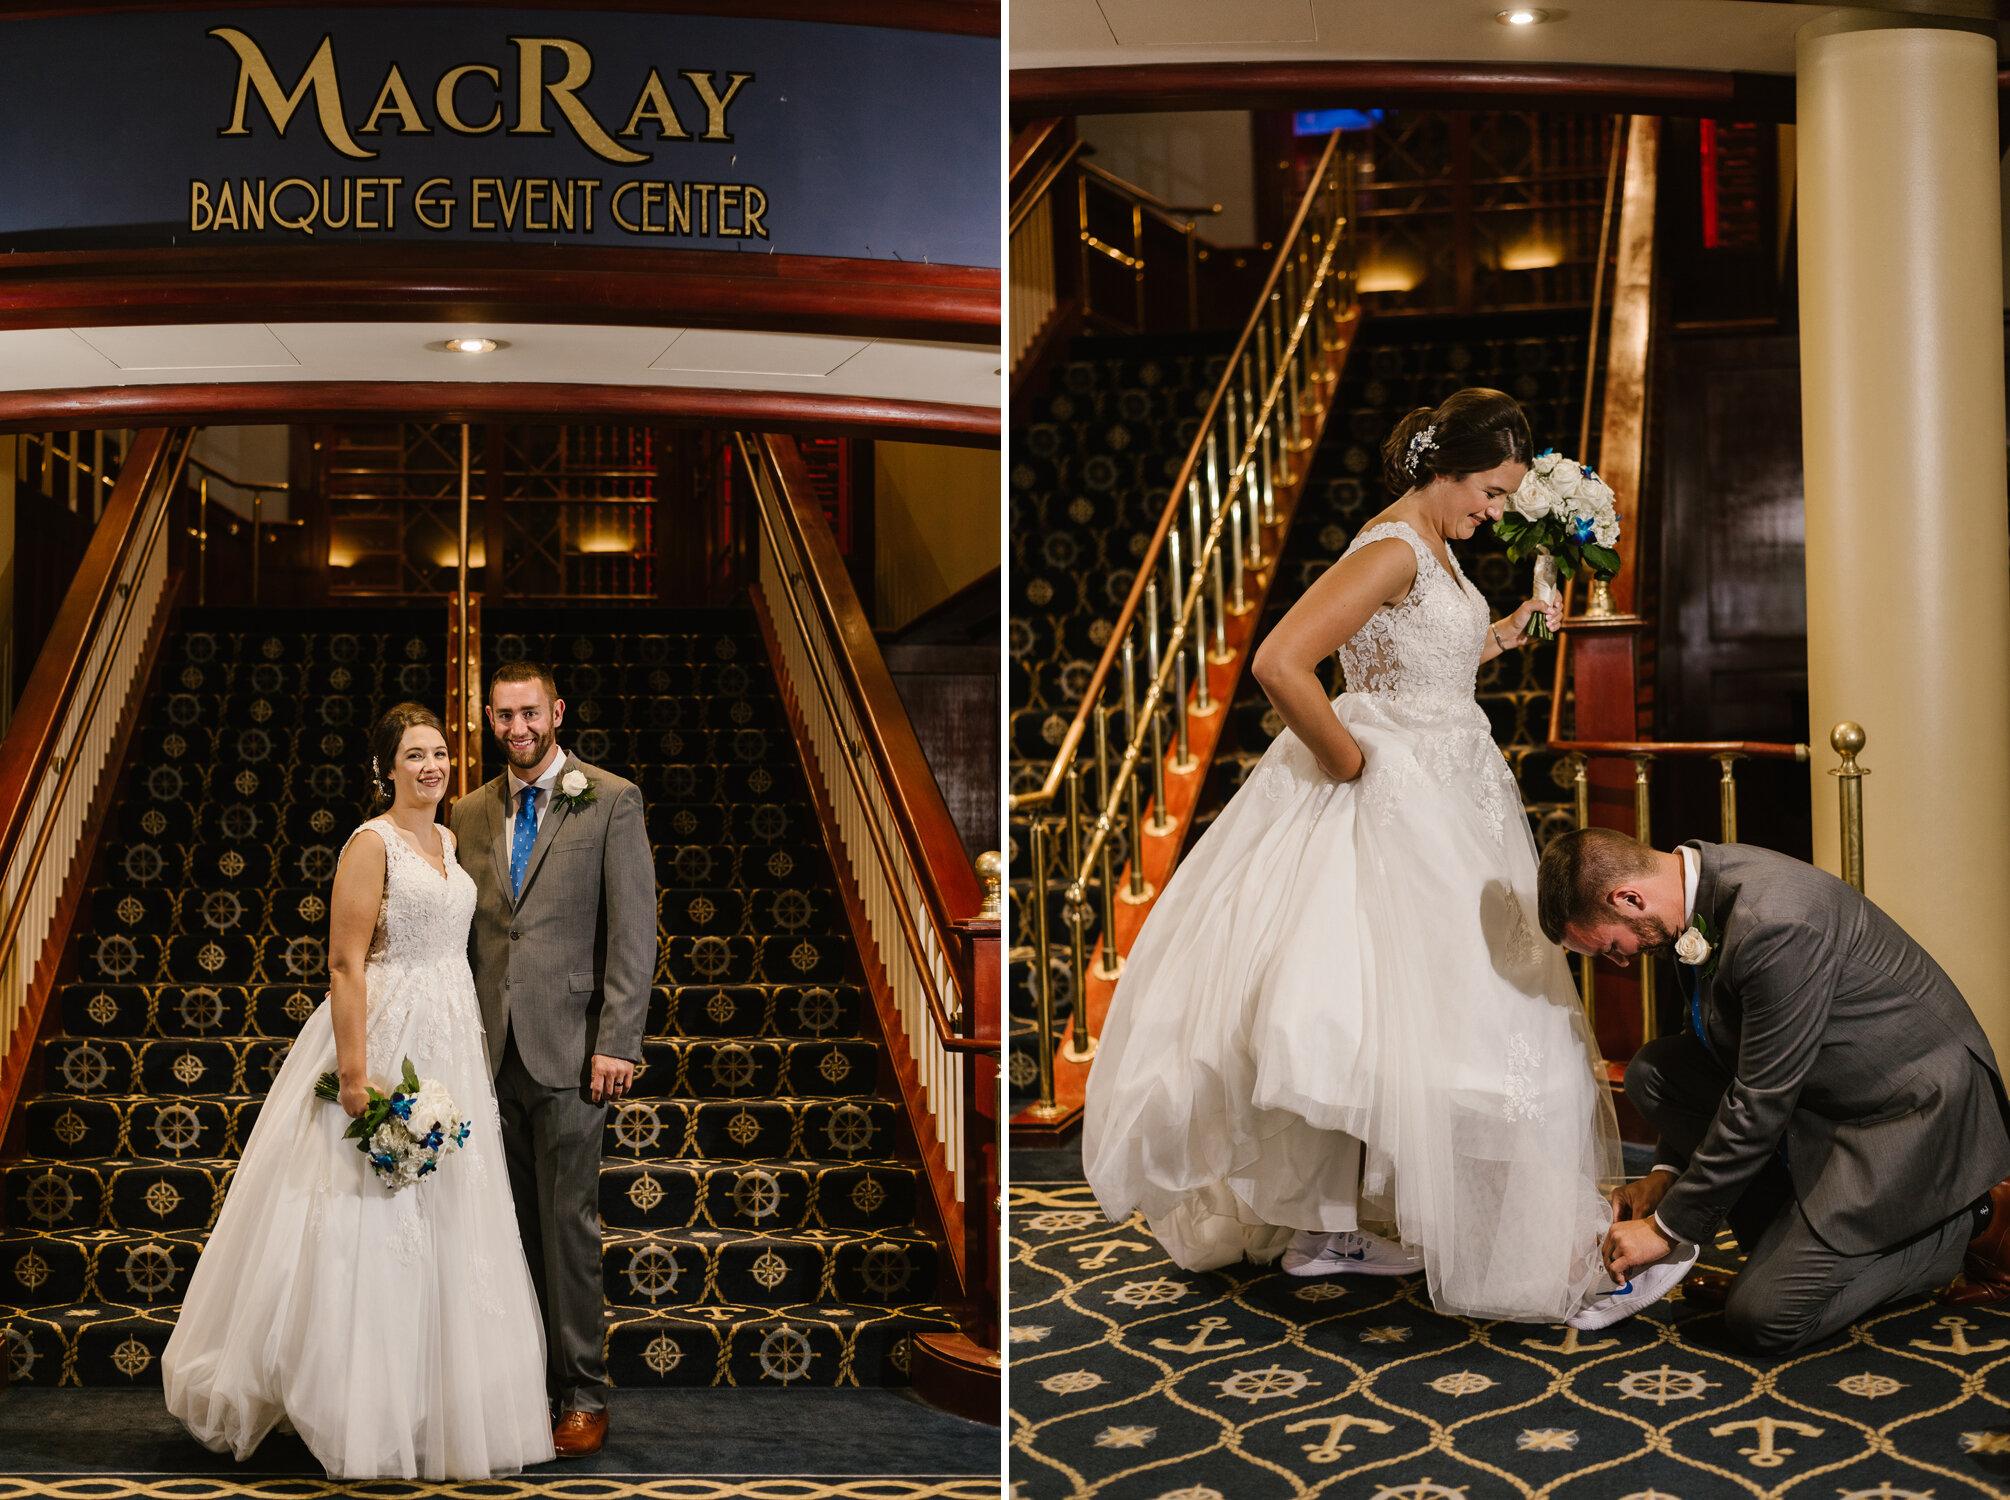 st-clair-shores-wedding-macray-harbor (109).jpg